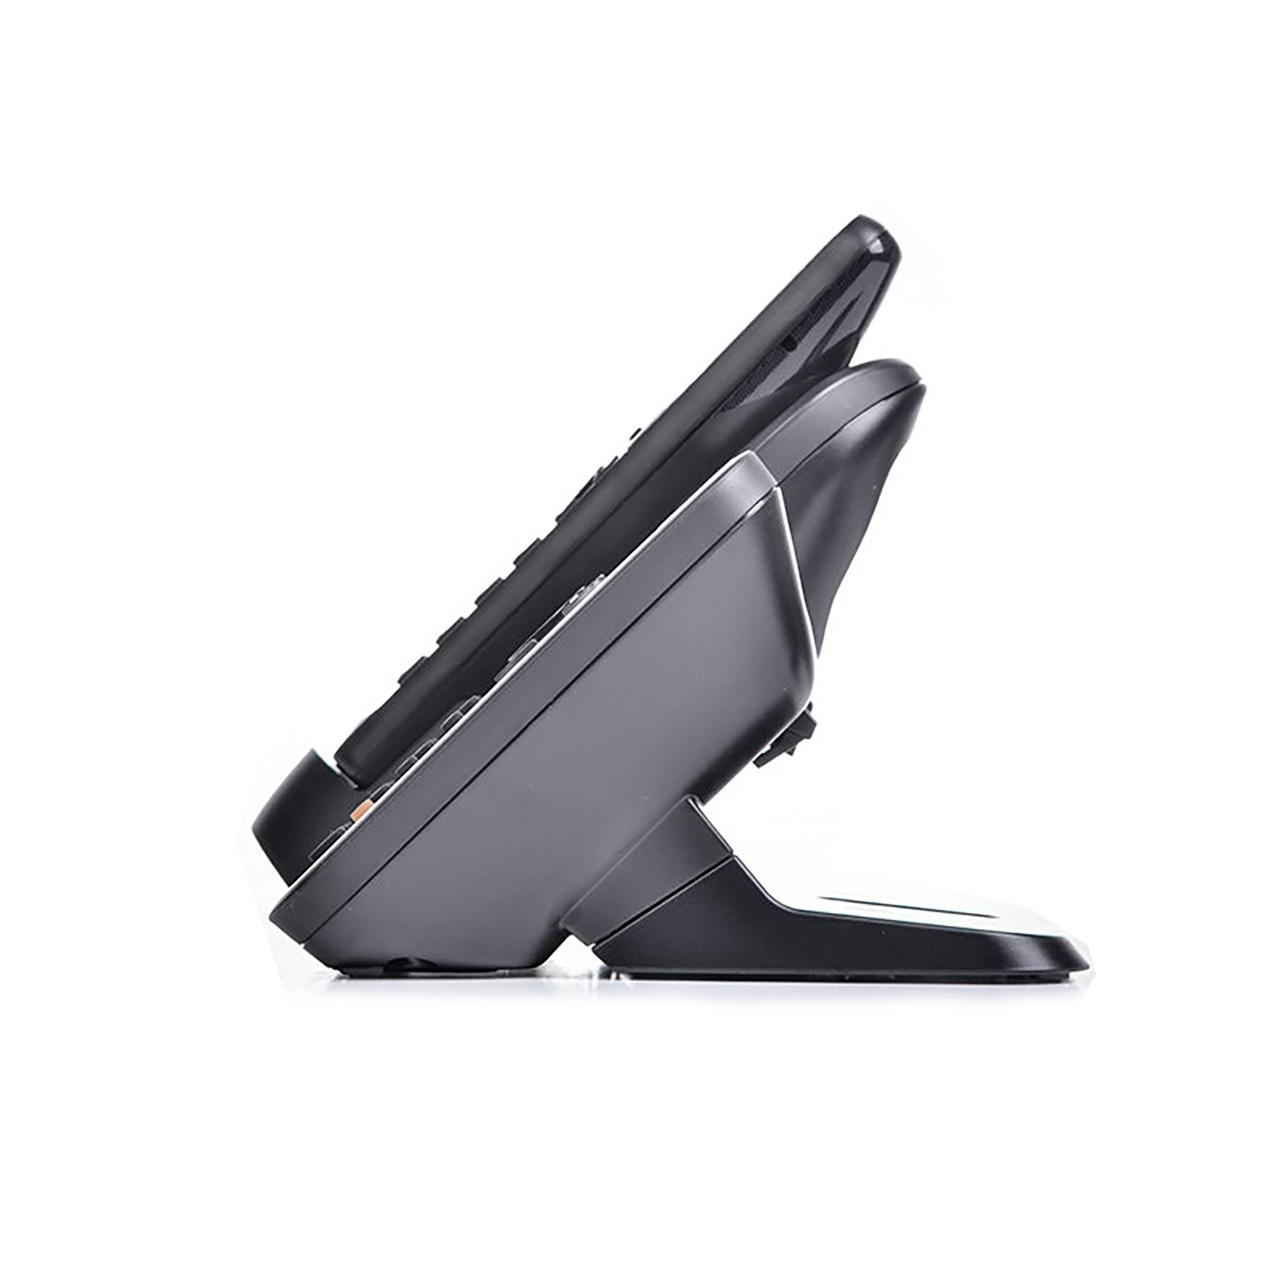 گوشی تلفن بیسیم پاناسونیک مدل Panasonic-KX-TG3822JX ساخت ژاپن | پایه